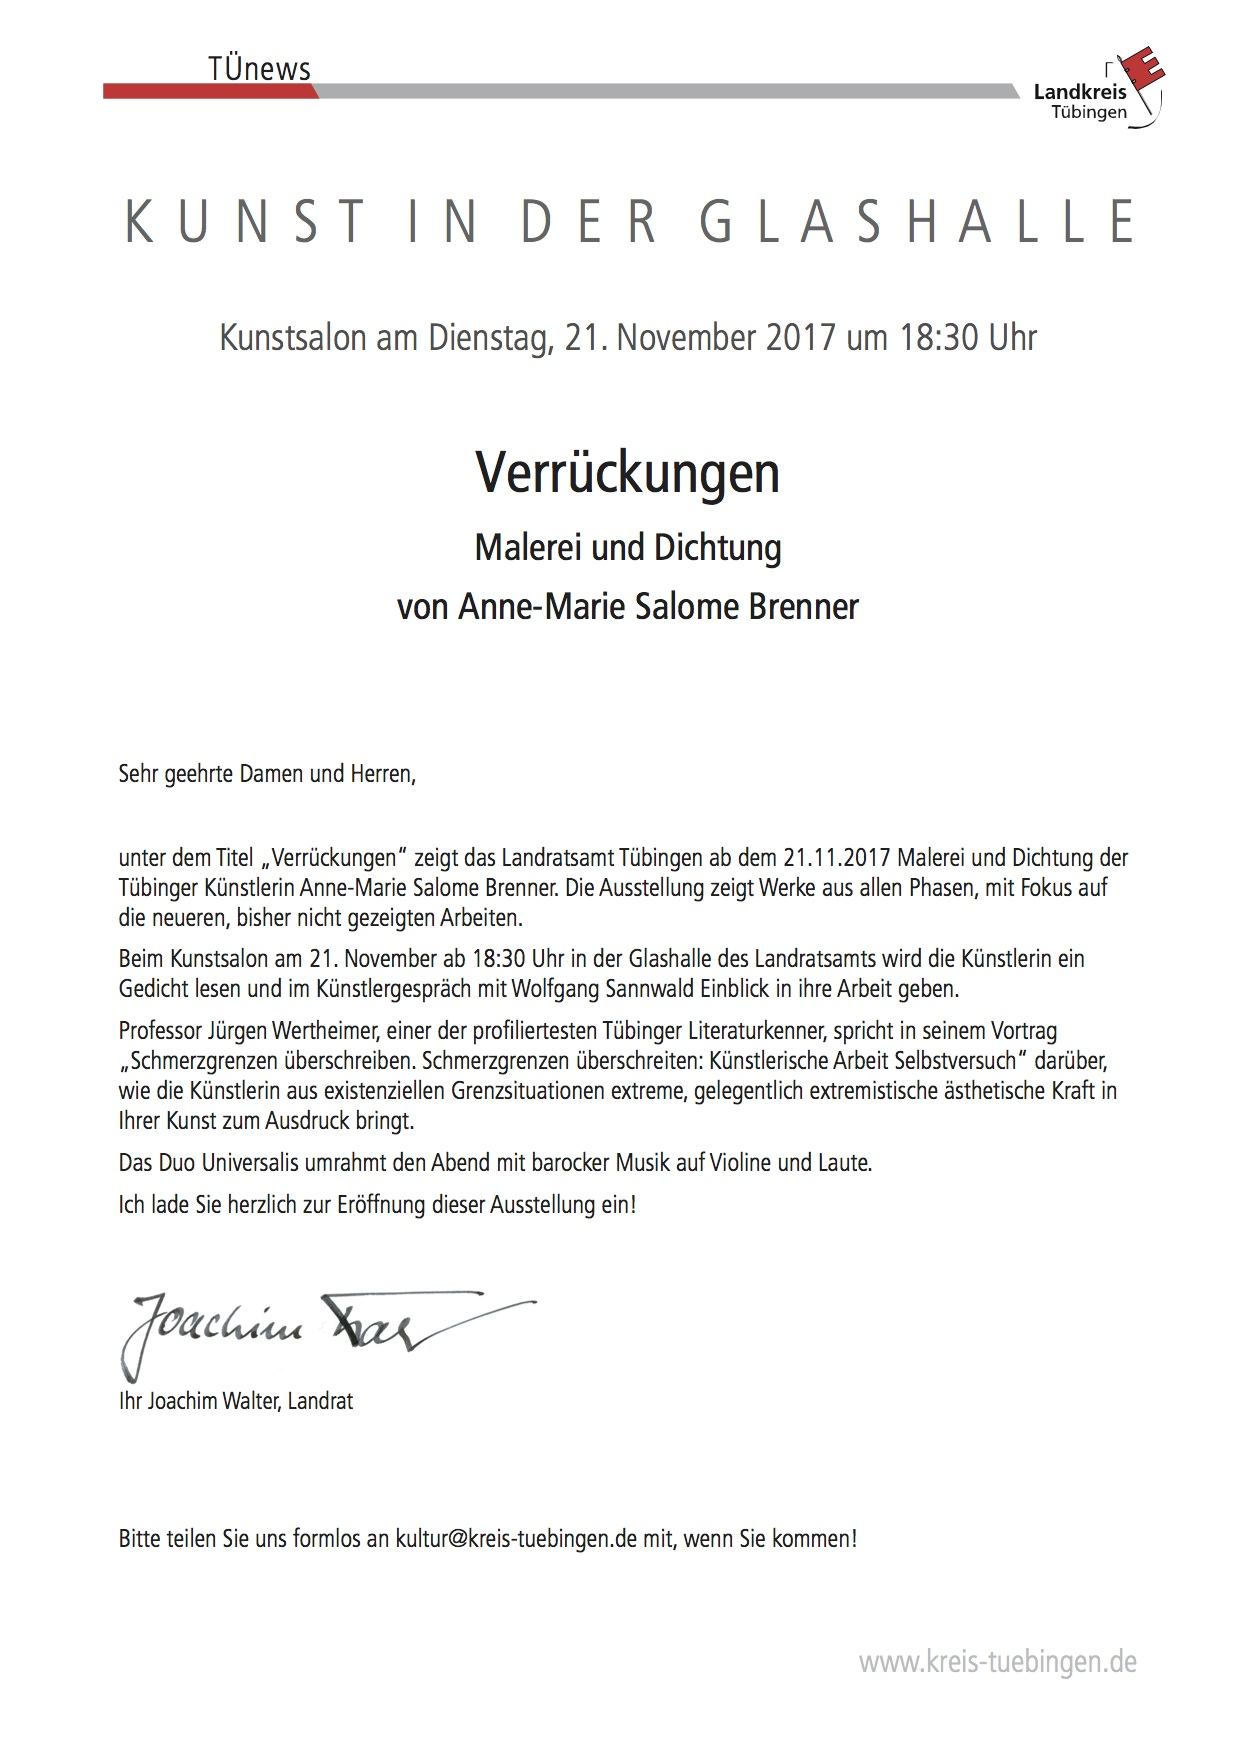 2017_11_06 Einladung ASBrenner final2.jpg